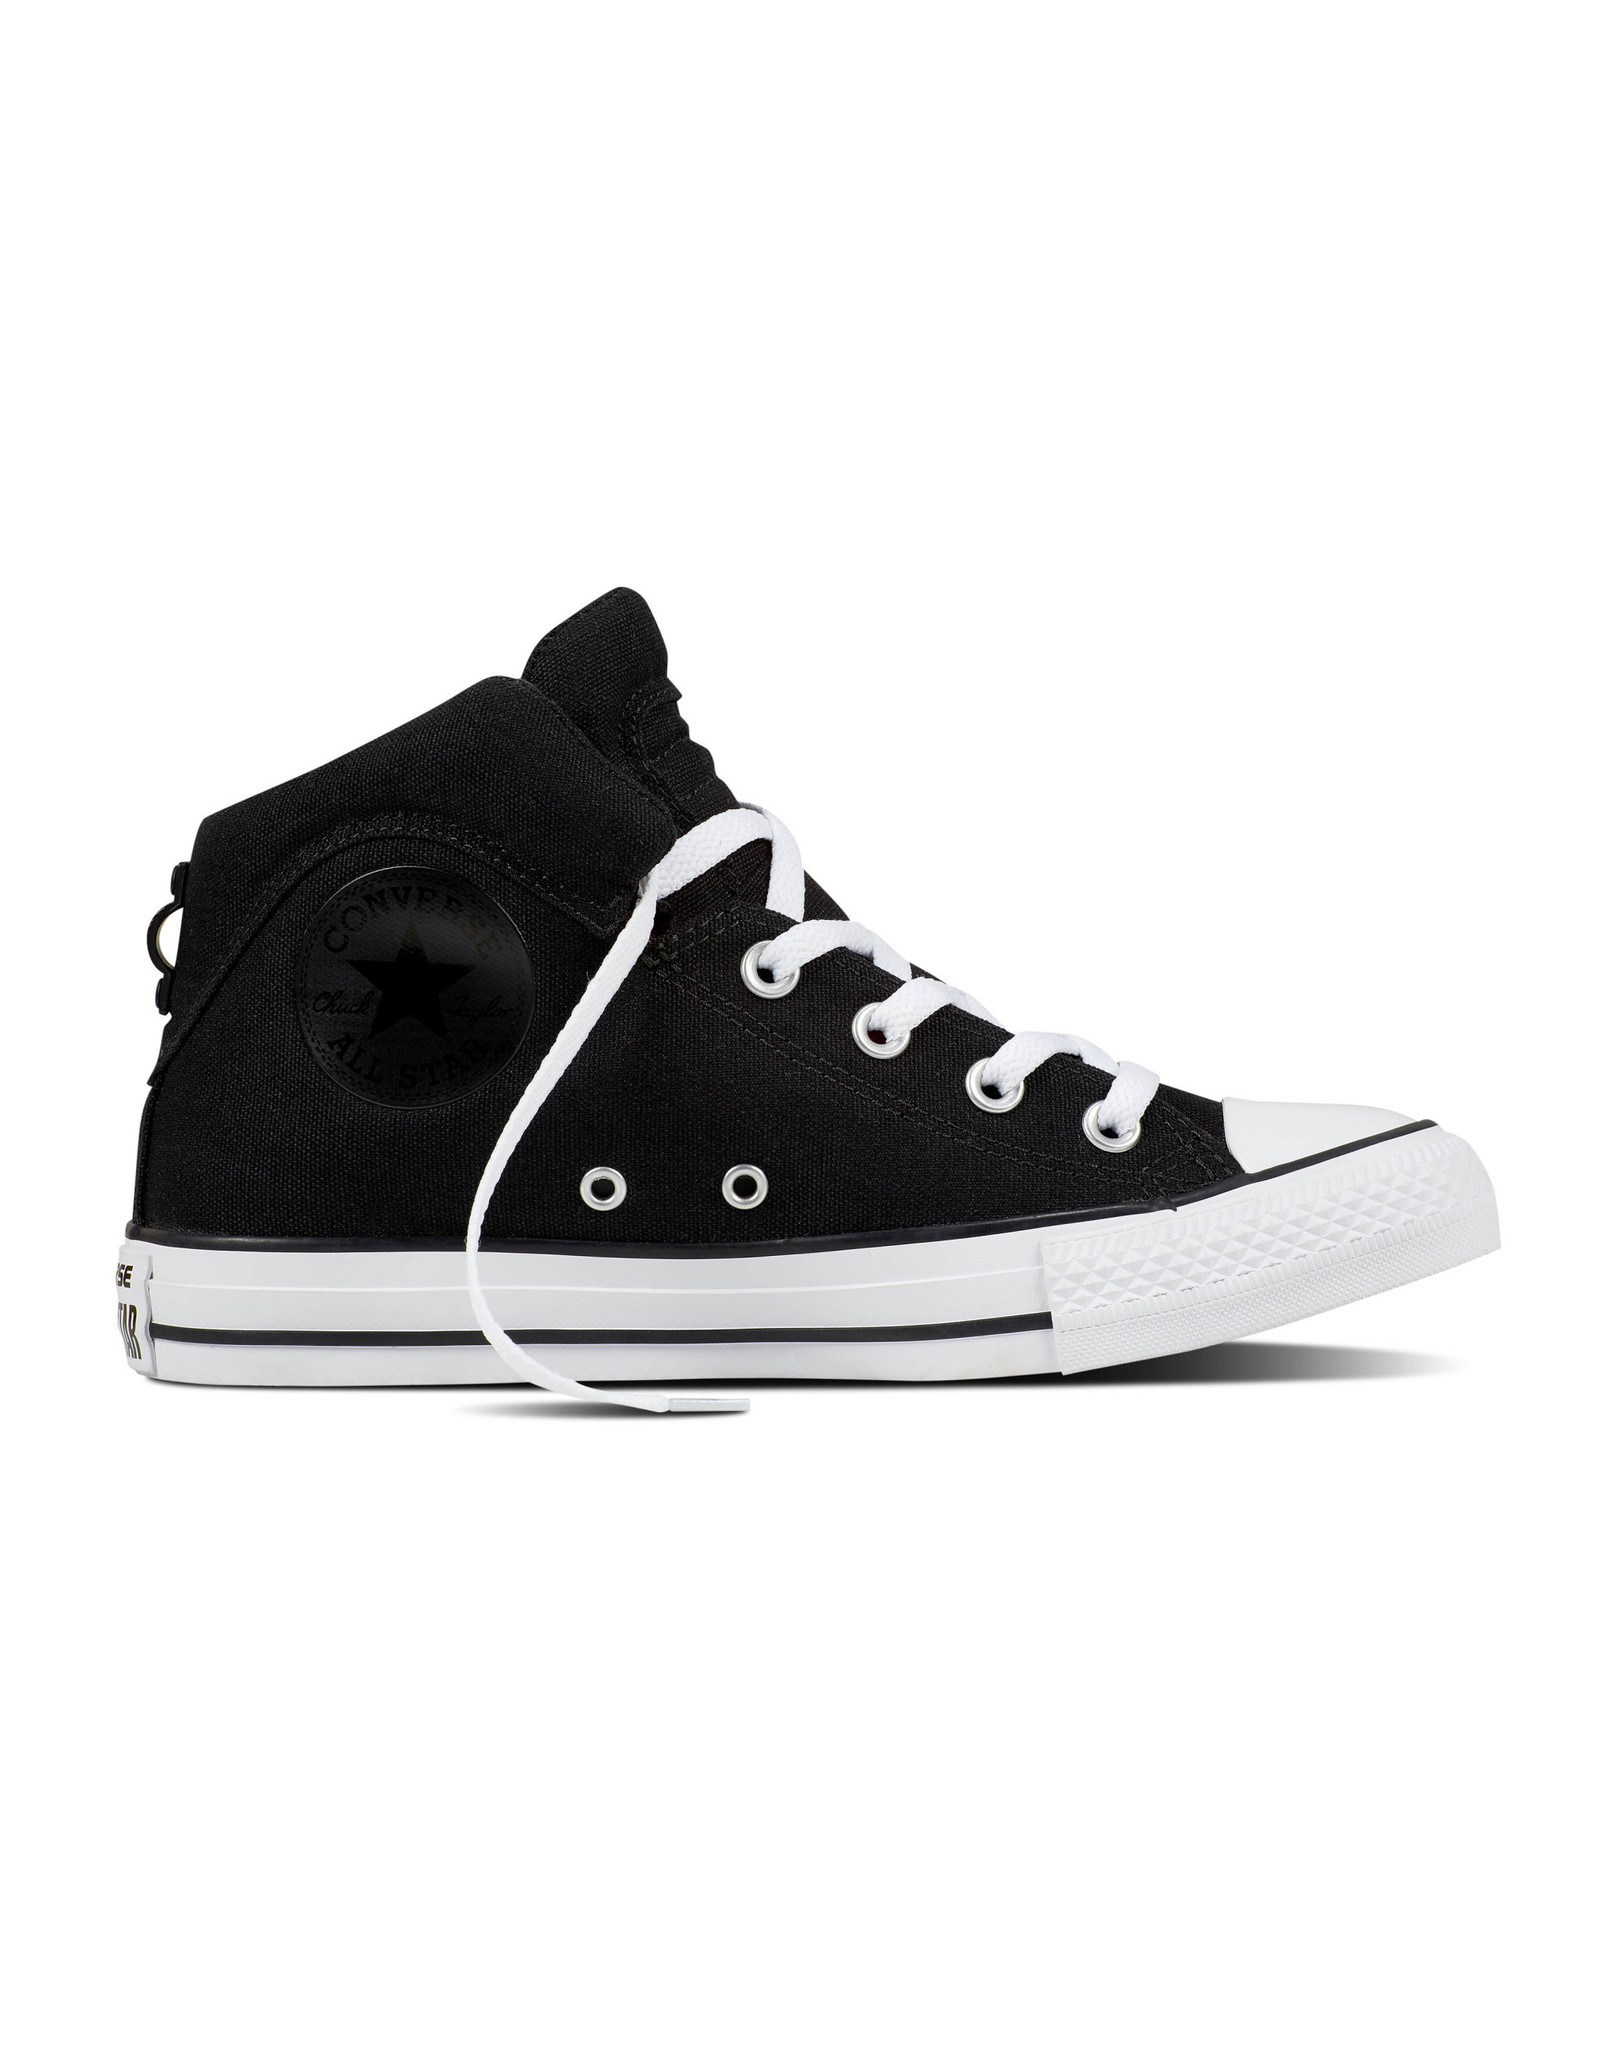 CONVERSE CHUCK TAYLOR BROOKLINE MID BLACK/BLACK/WHITE C798BKB-557955C